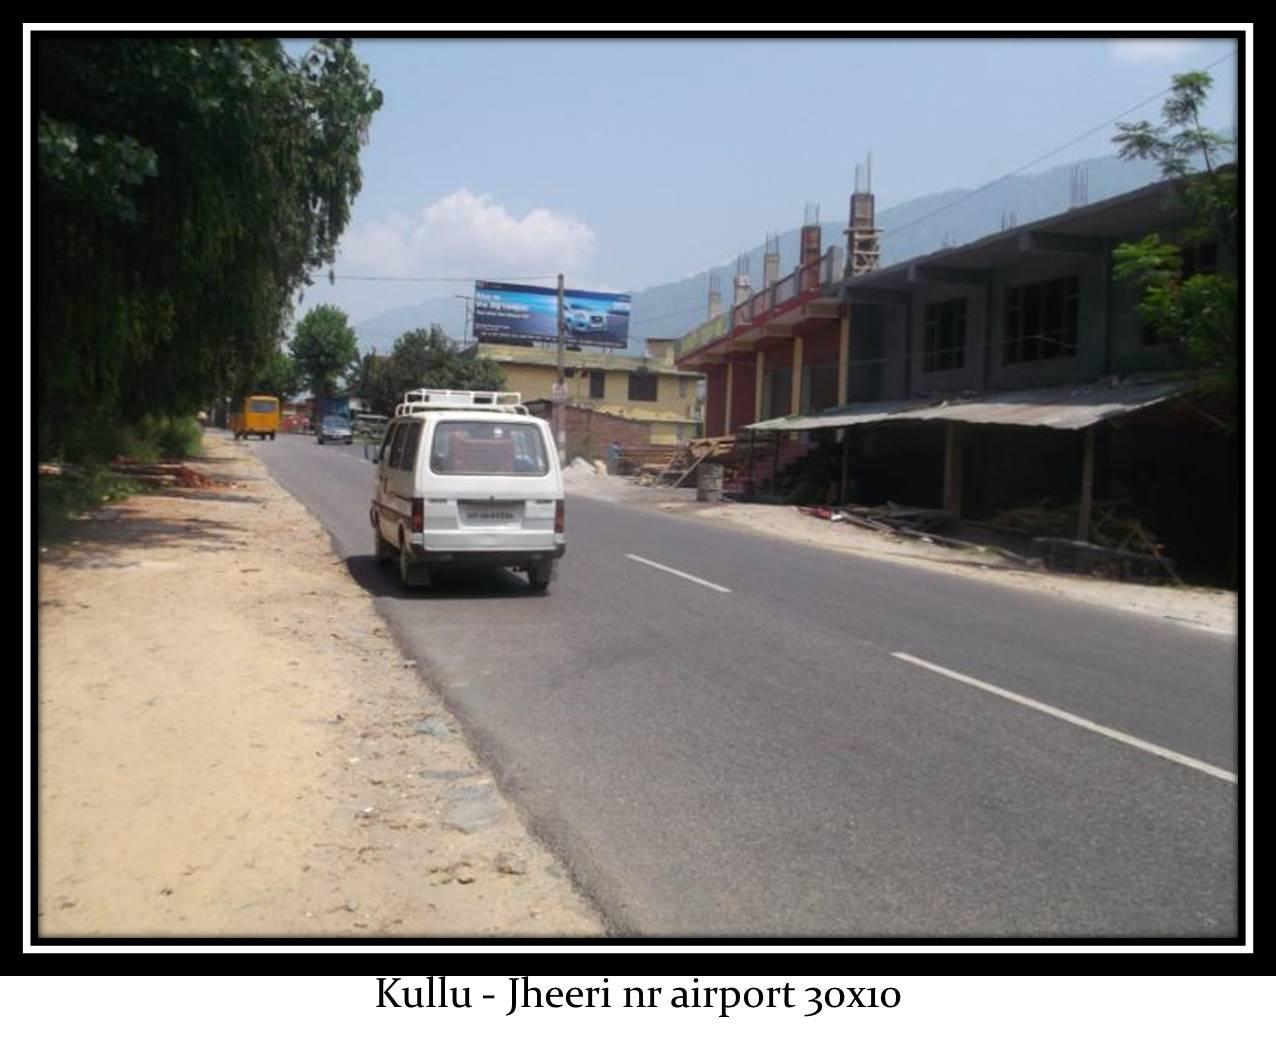 Jheeri nr airport, Kullu